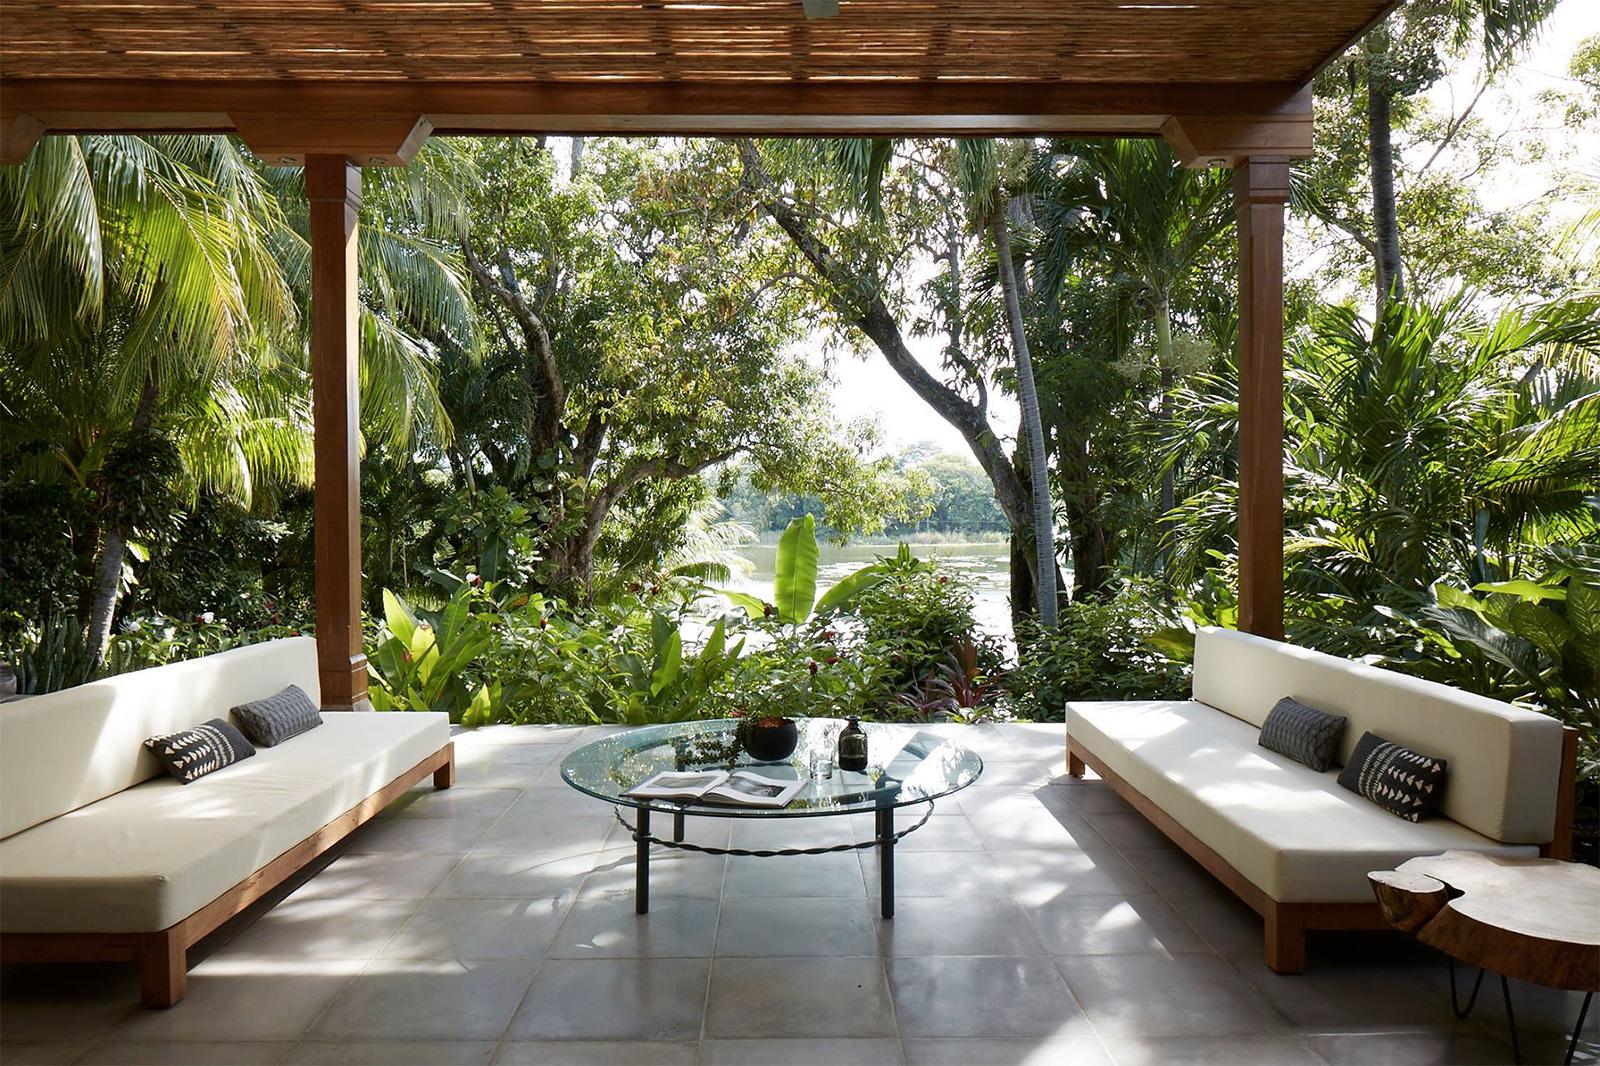 Inside a secluded island hacienda in Nicaragua